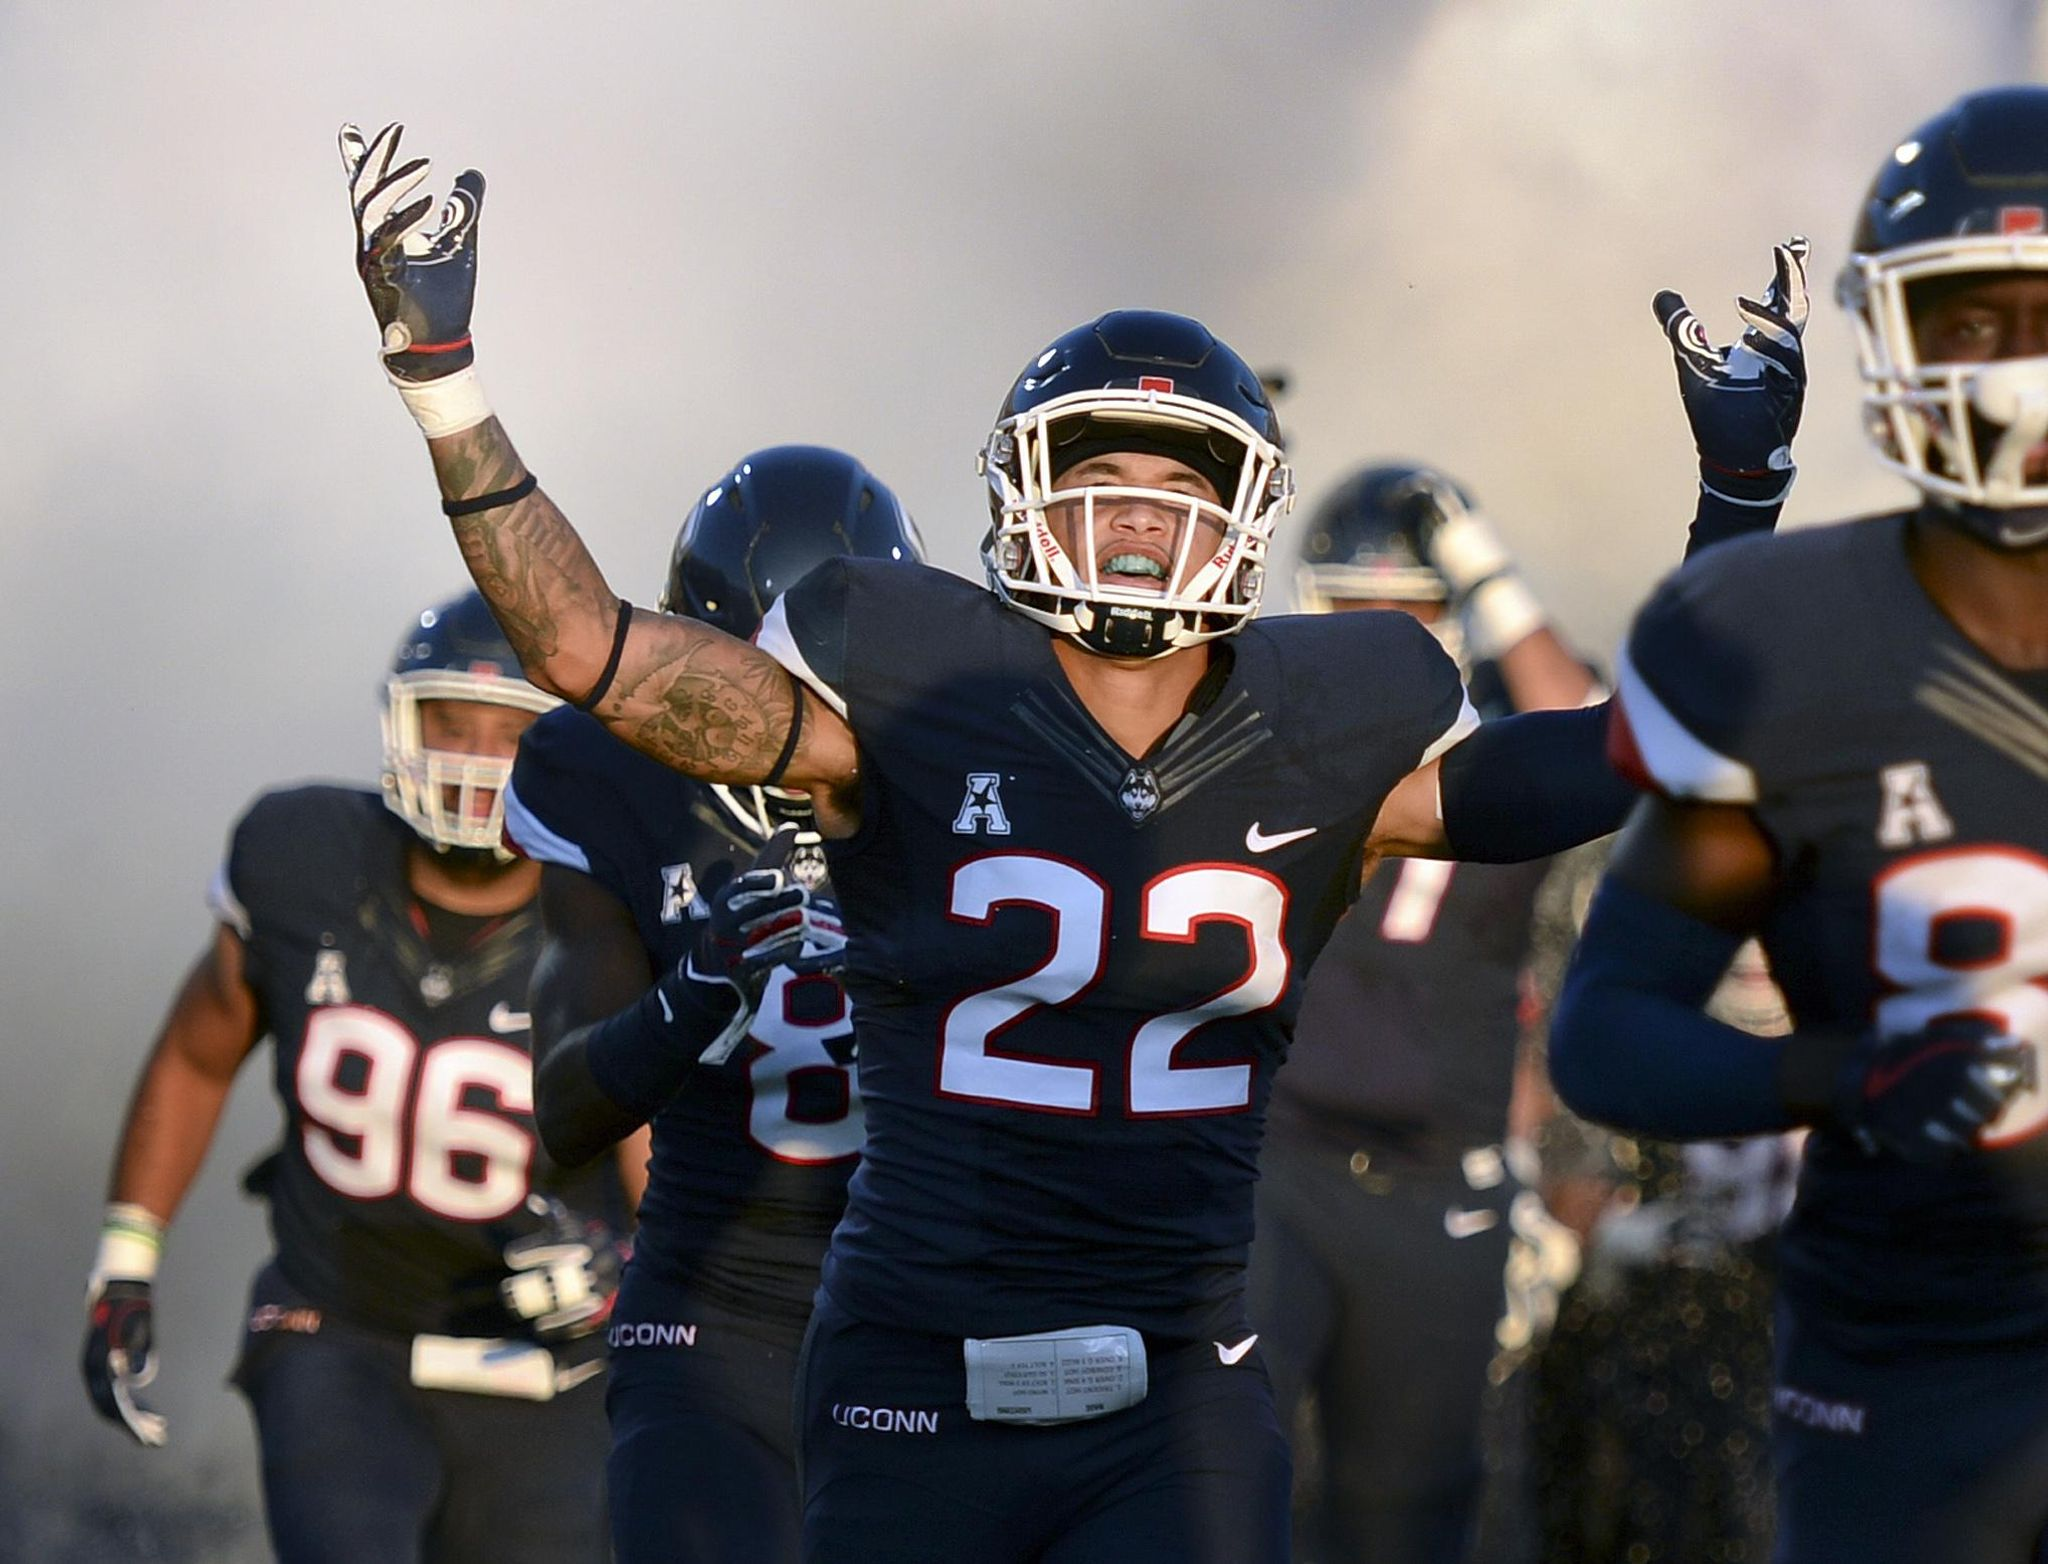 UConn linebacker hospitalized after suffering stroke - Washington Times